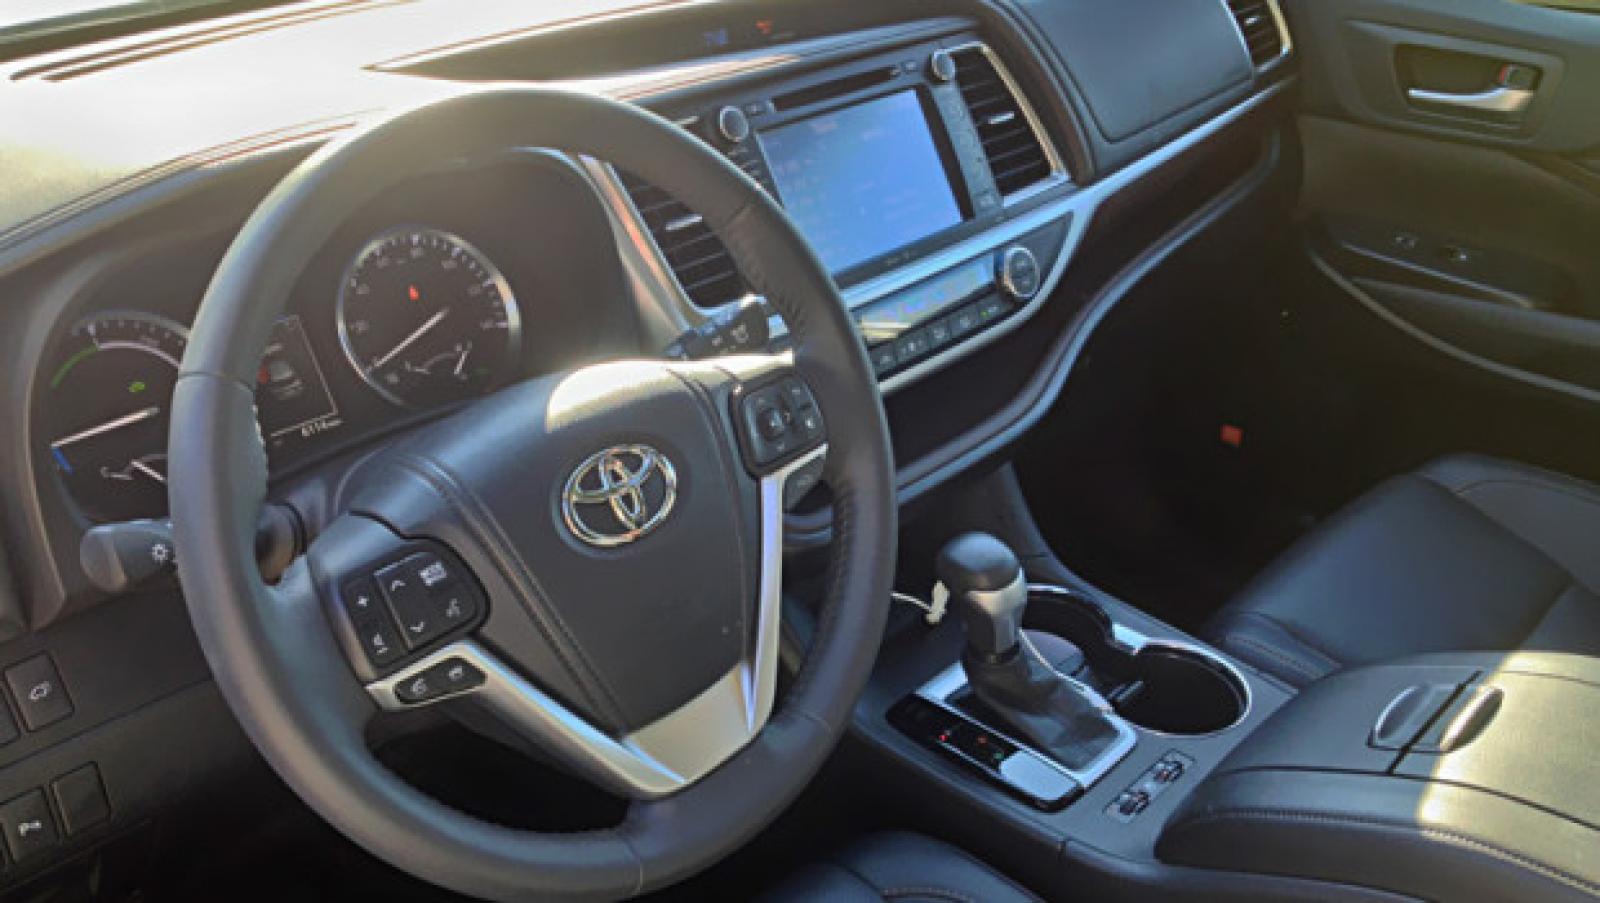 ... 2015 Toyota Highlander Hybrid #3 800 1024 1280 1600 Origin ...